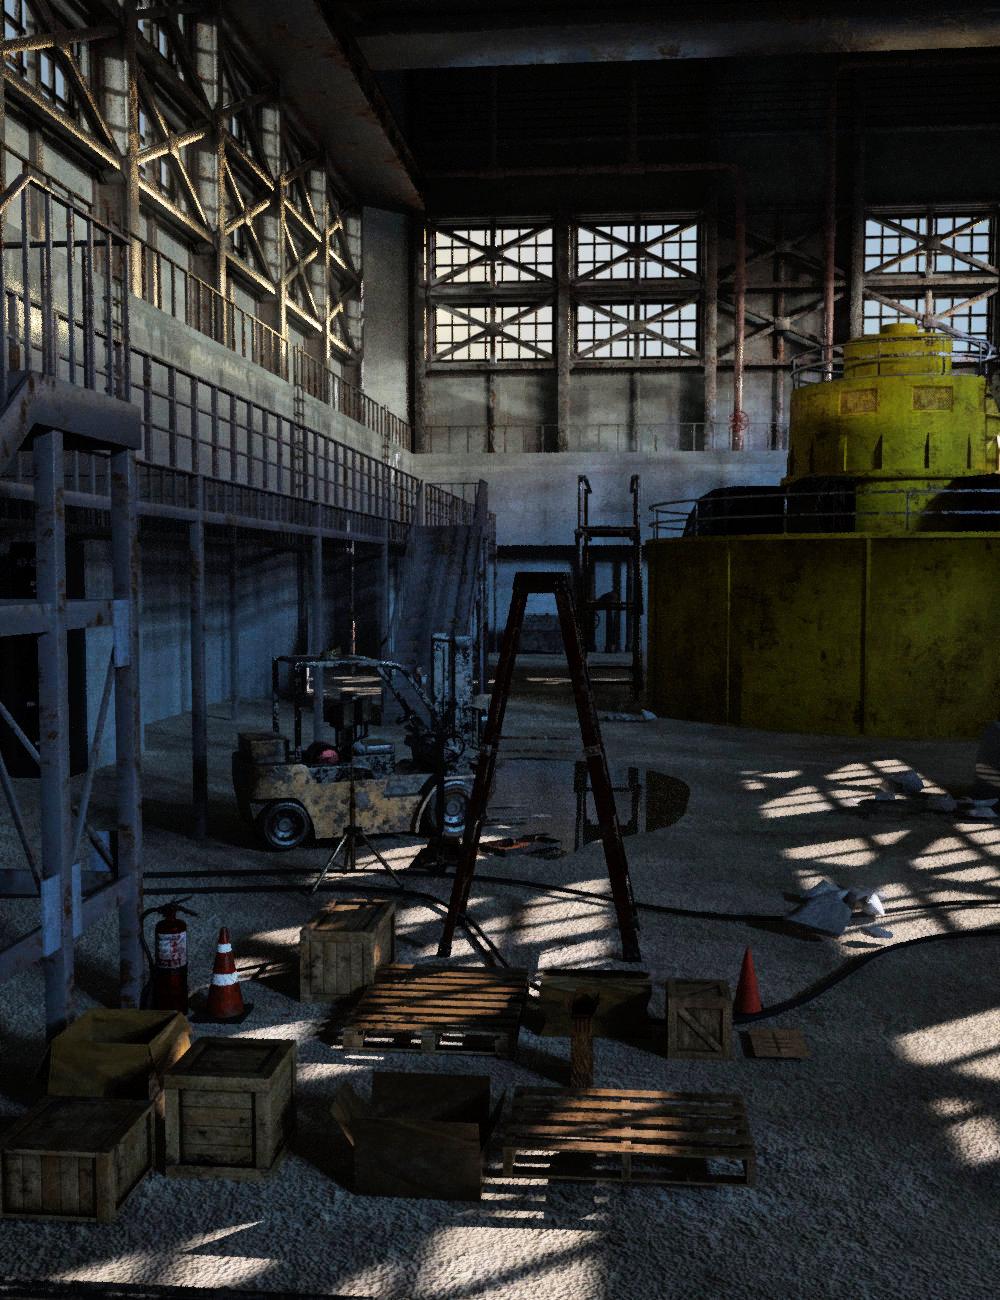 FG Generator Hall by: Fugazi1968Ironman, 3D Models by Daz 3D